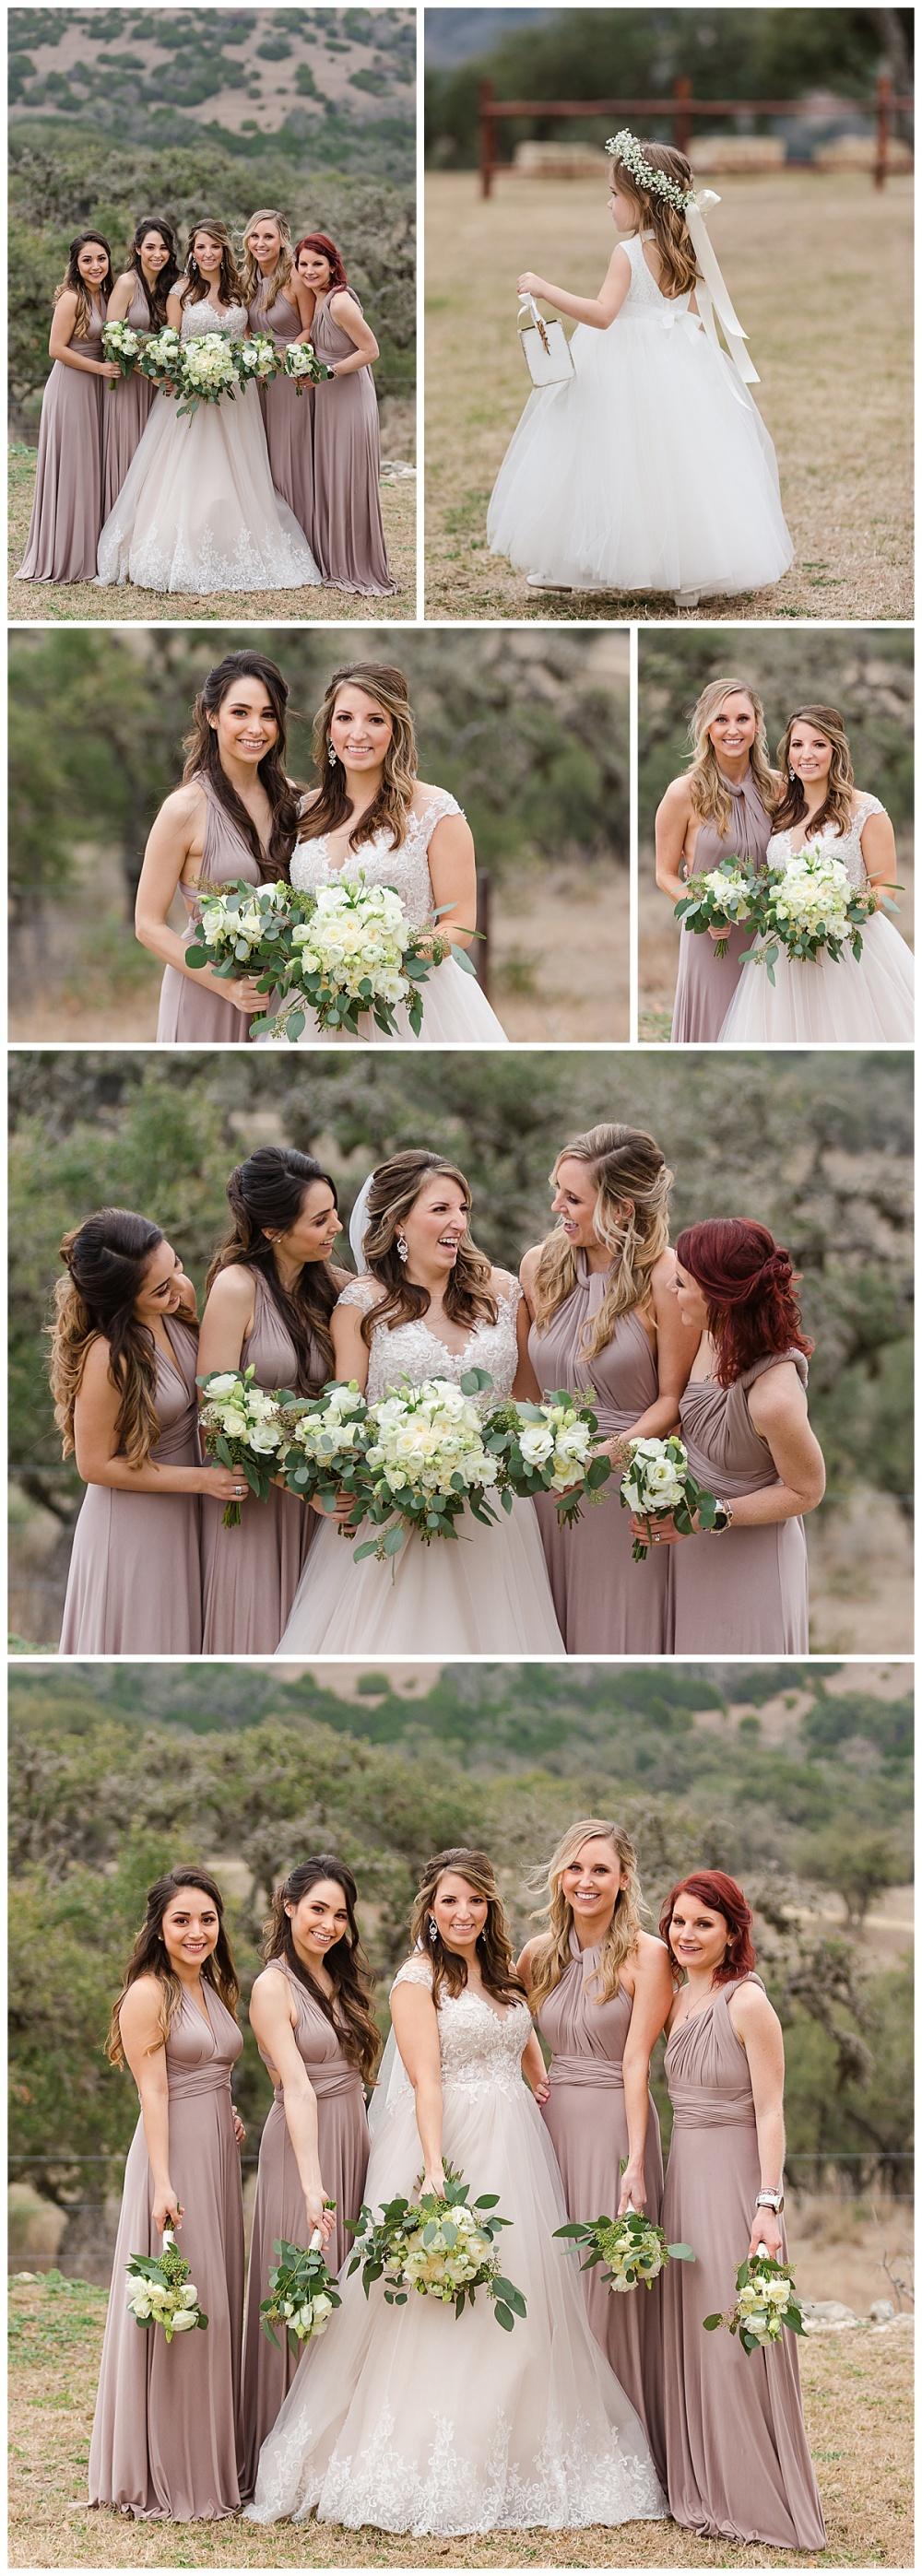 Wedding-Photographer-Texas-Hill-Country-Happy-H-Ranch-Comfor-Texas-Carly-Barton-Photography_0040.jpg